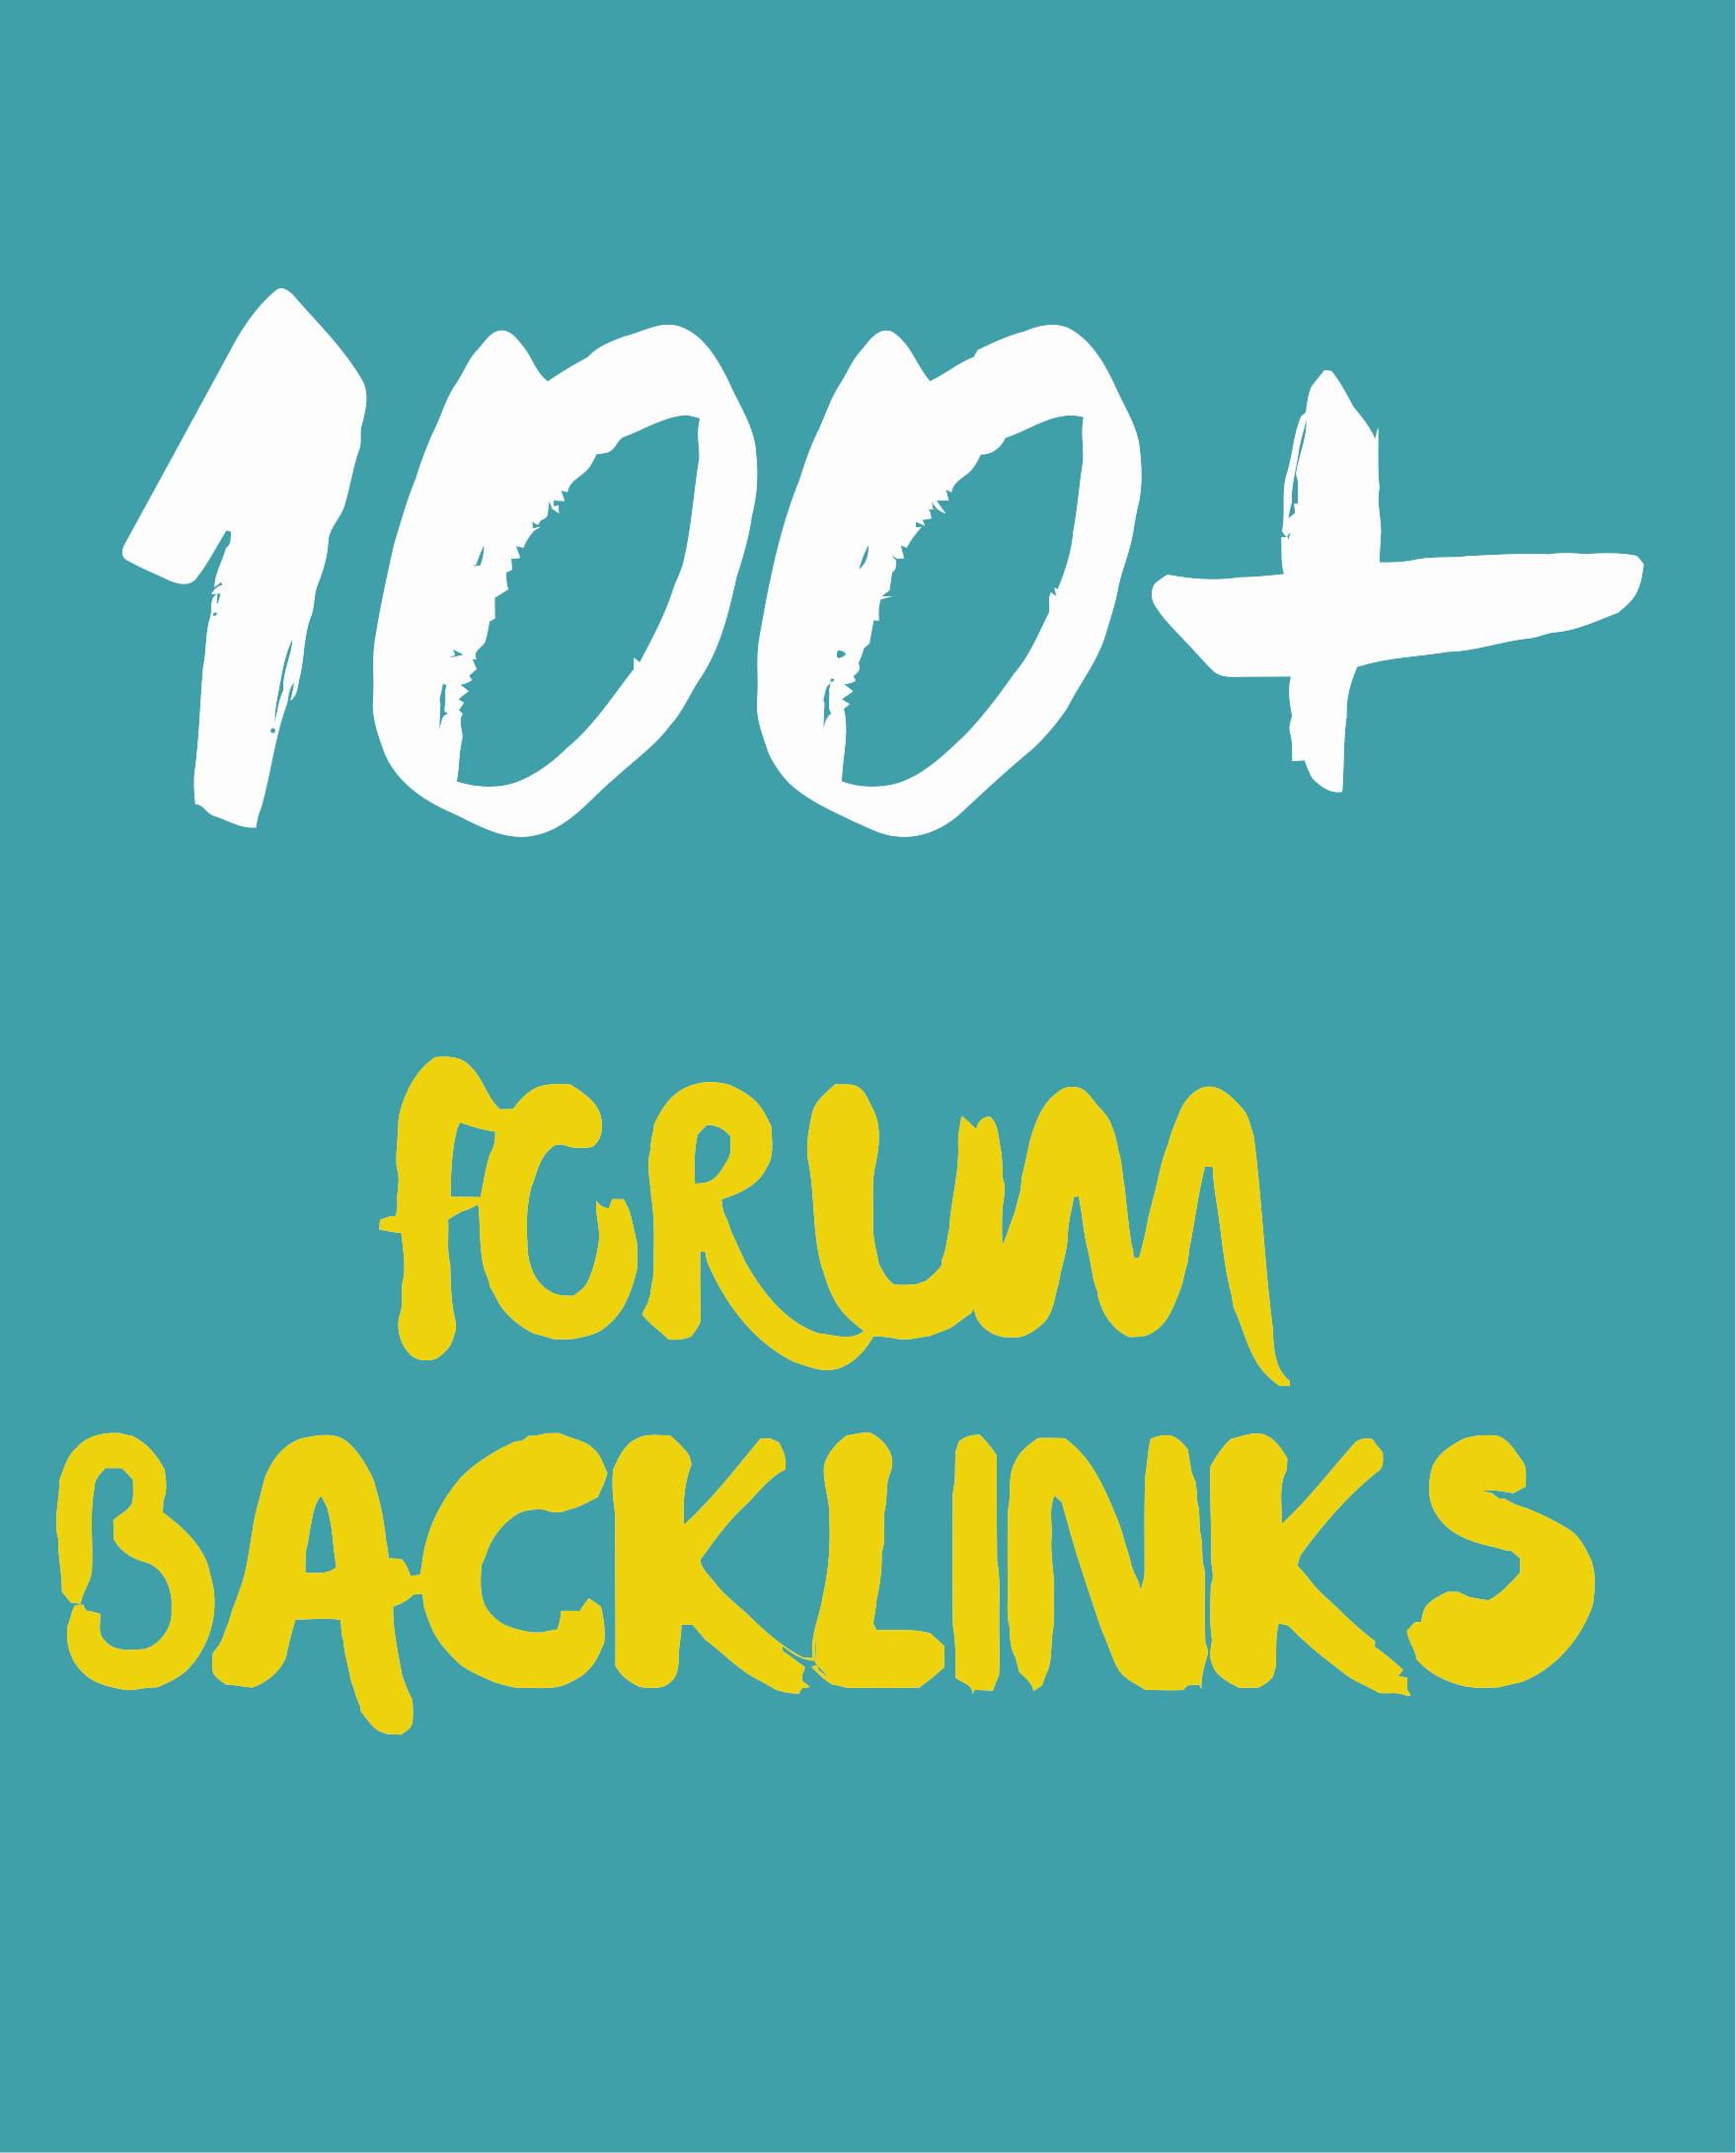 100 Forum profile backlinks from Unique domain